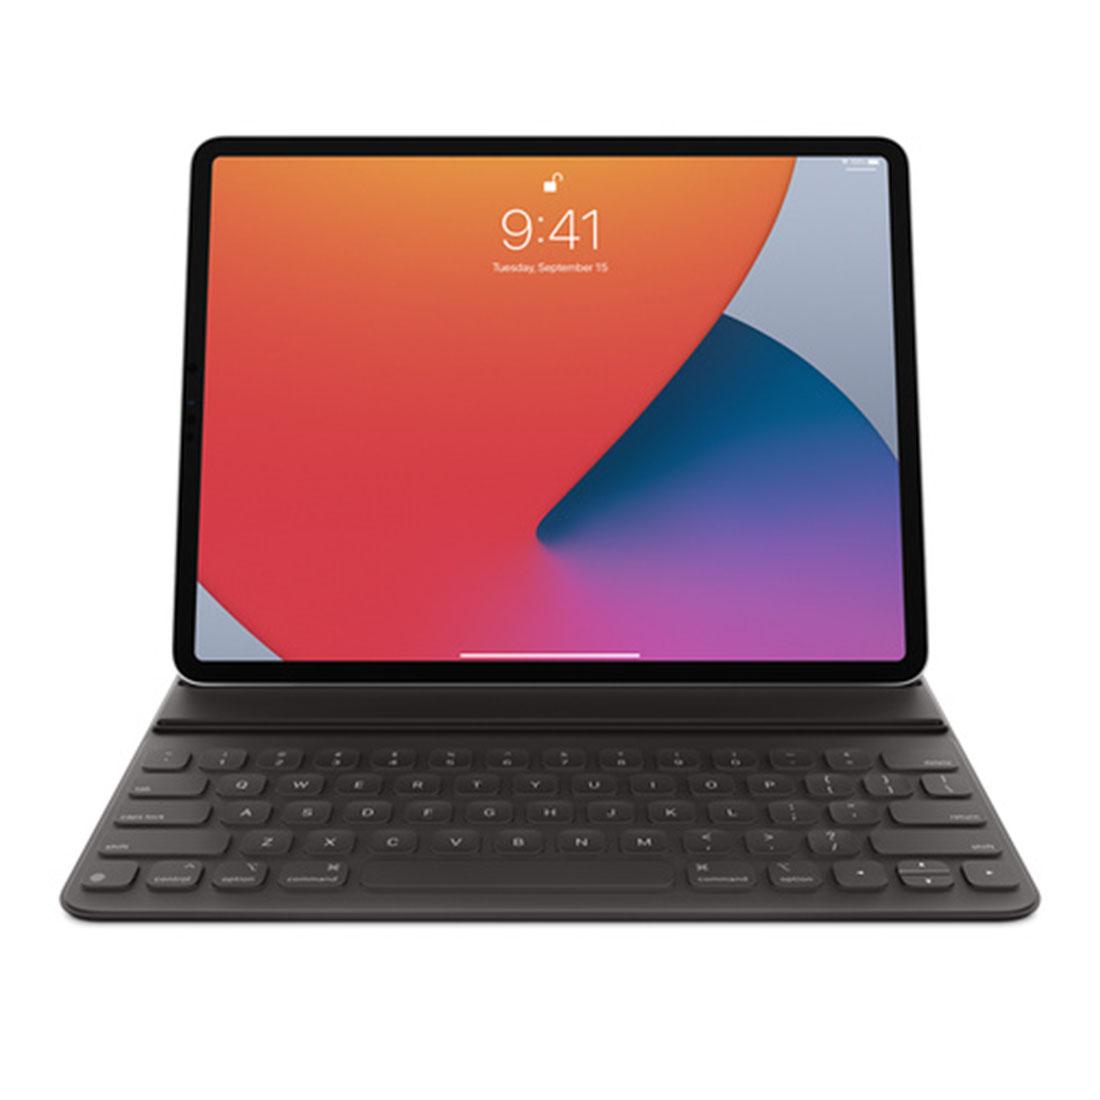 Teclado Smart Keyboard Folio iPad Pro 12.9 pol - MU8H2LL  - HARS